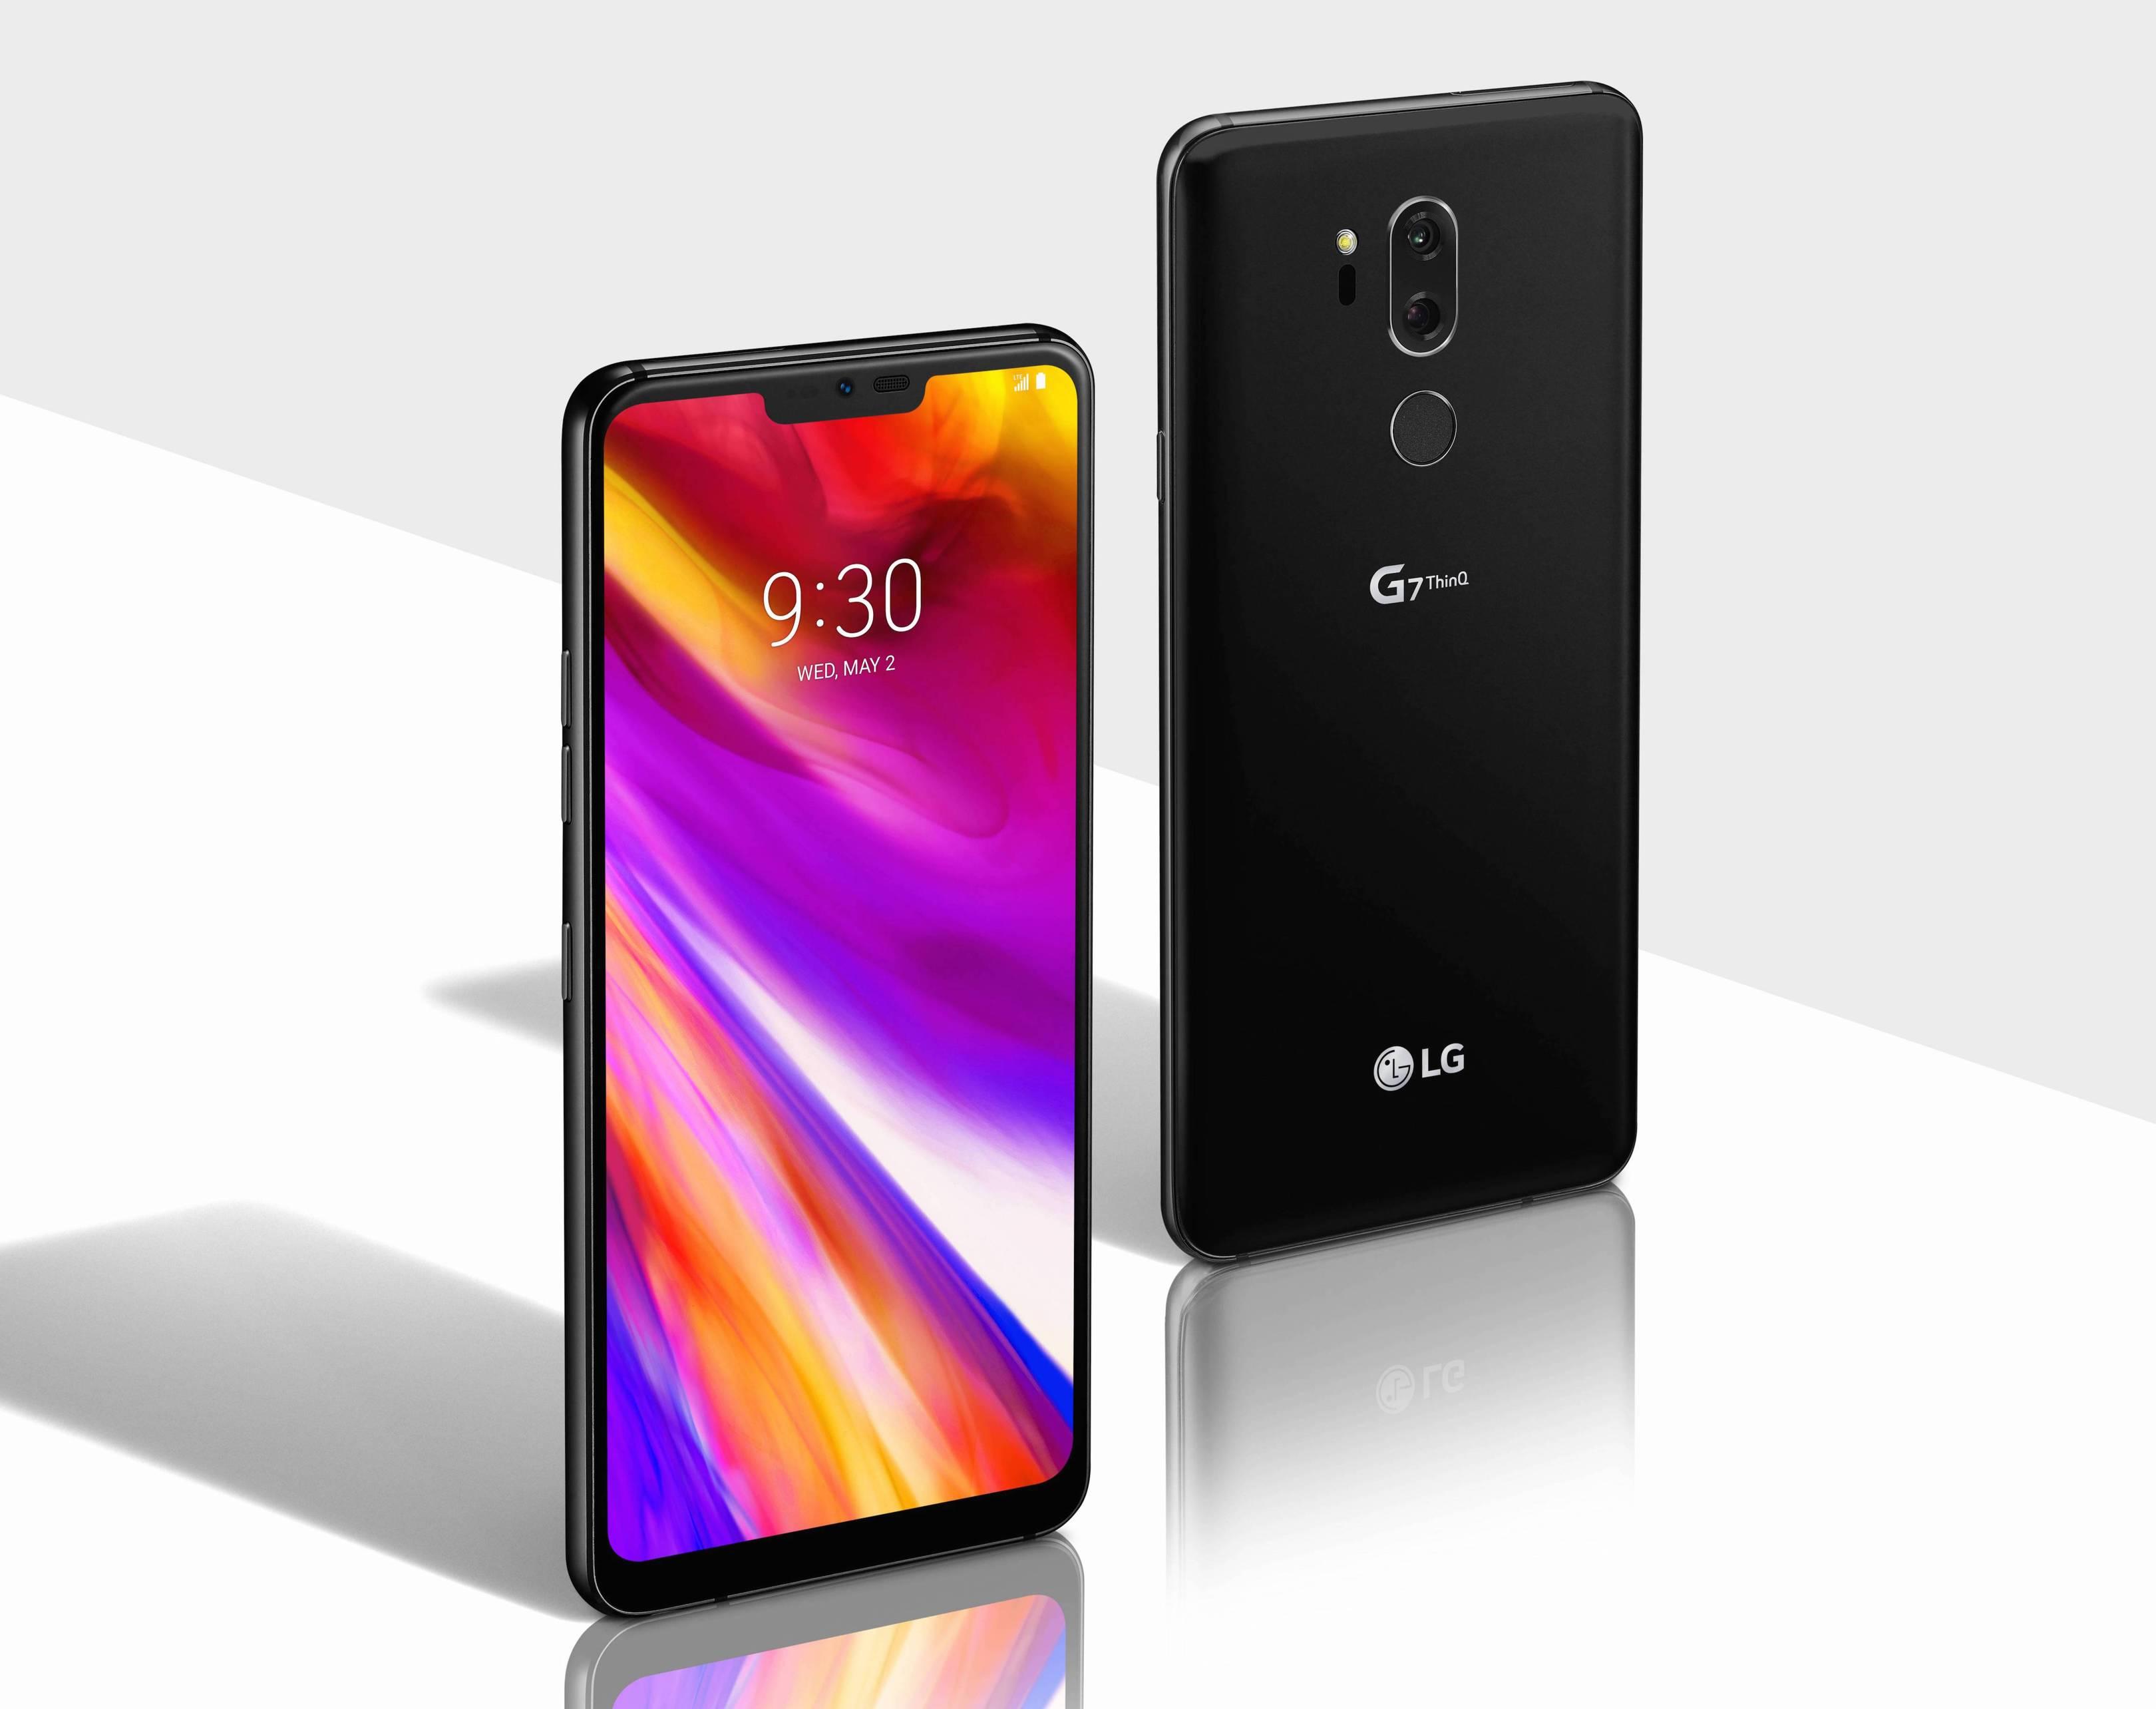 Представлен новый скучный флагман LG G7